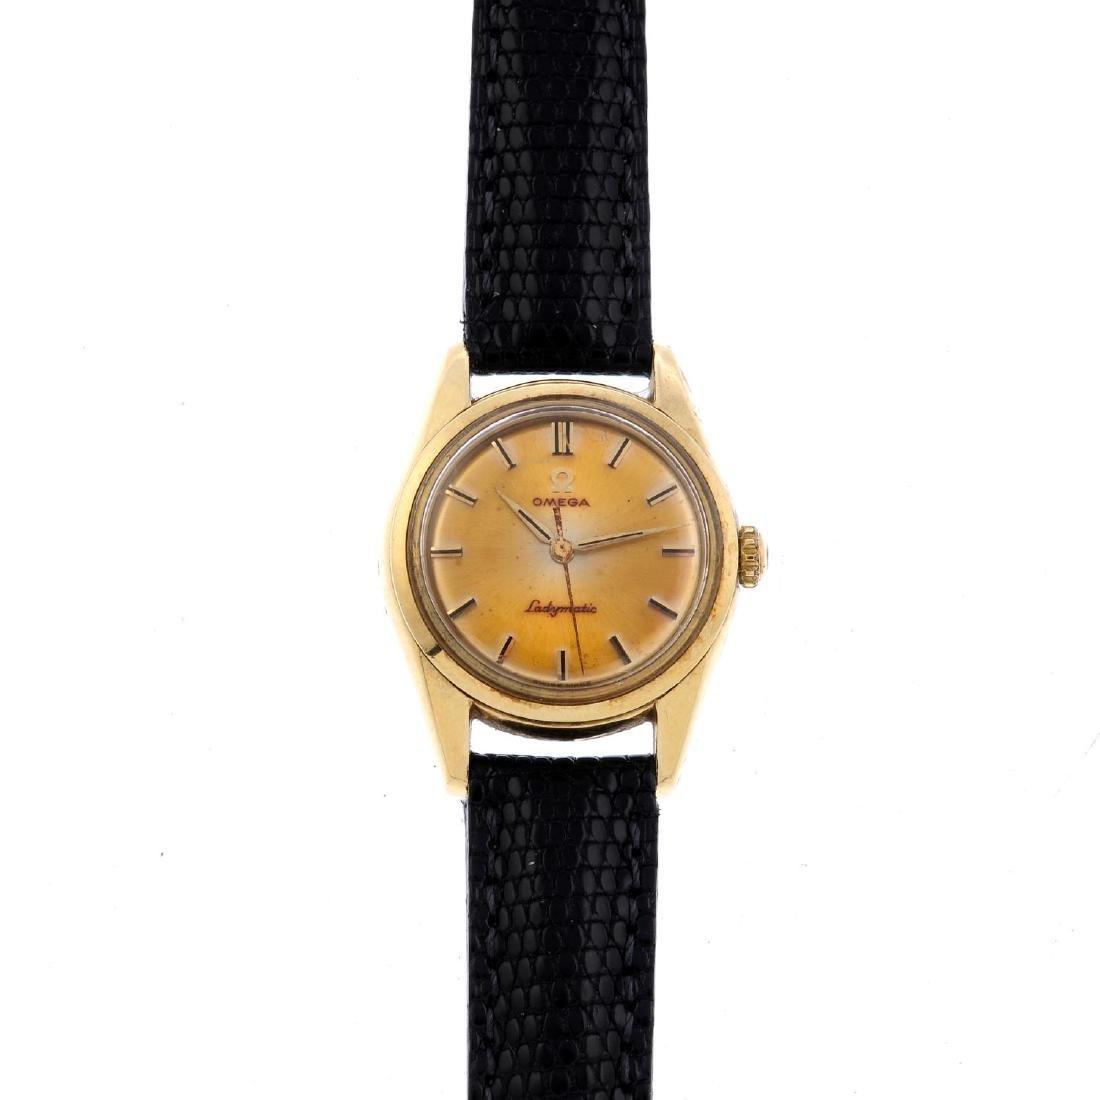 OMEGA - a lady's Ladymatic wrist watch. Gold plated